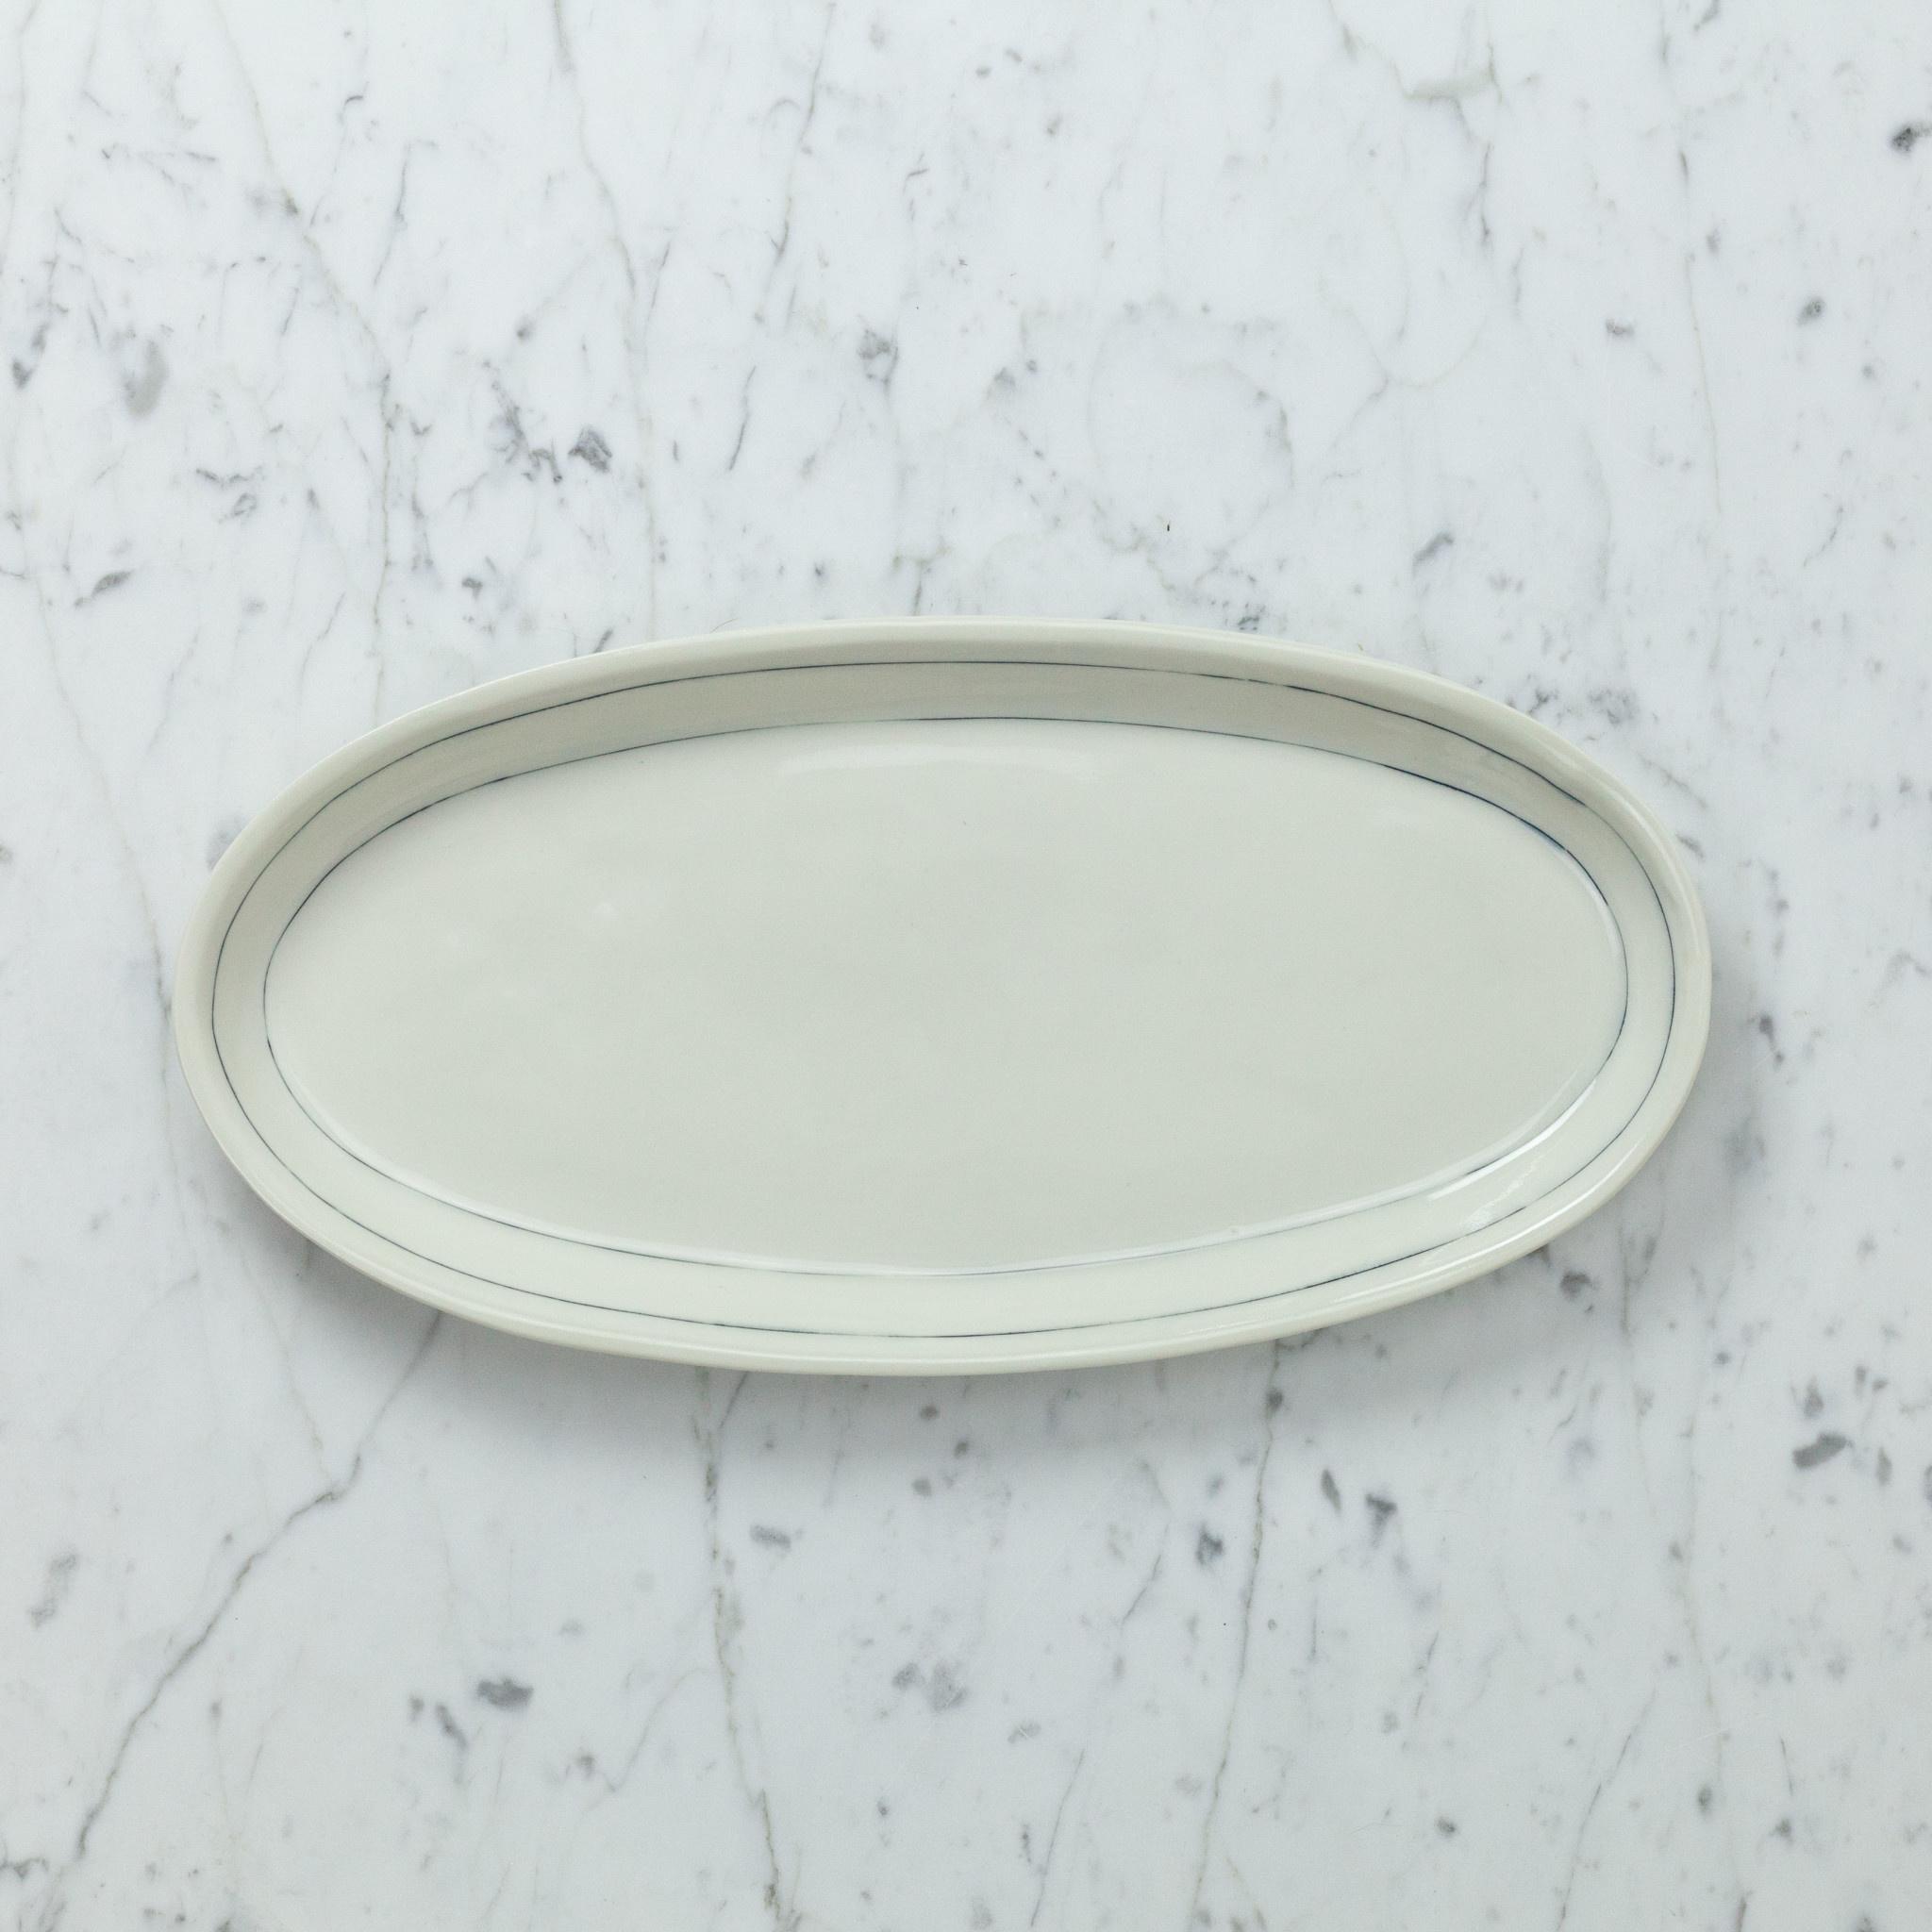 "Nicole Aquillano Nicole Aquillano Porcelain Simple Line Oval Serving Platter - Large - 13.75"""